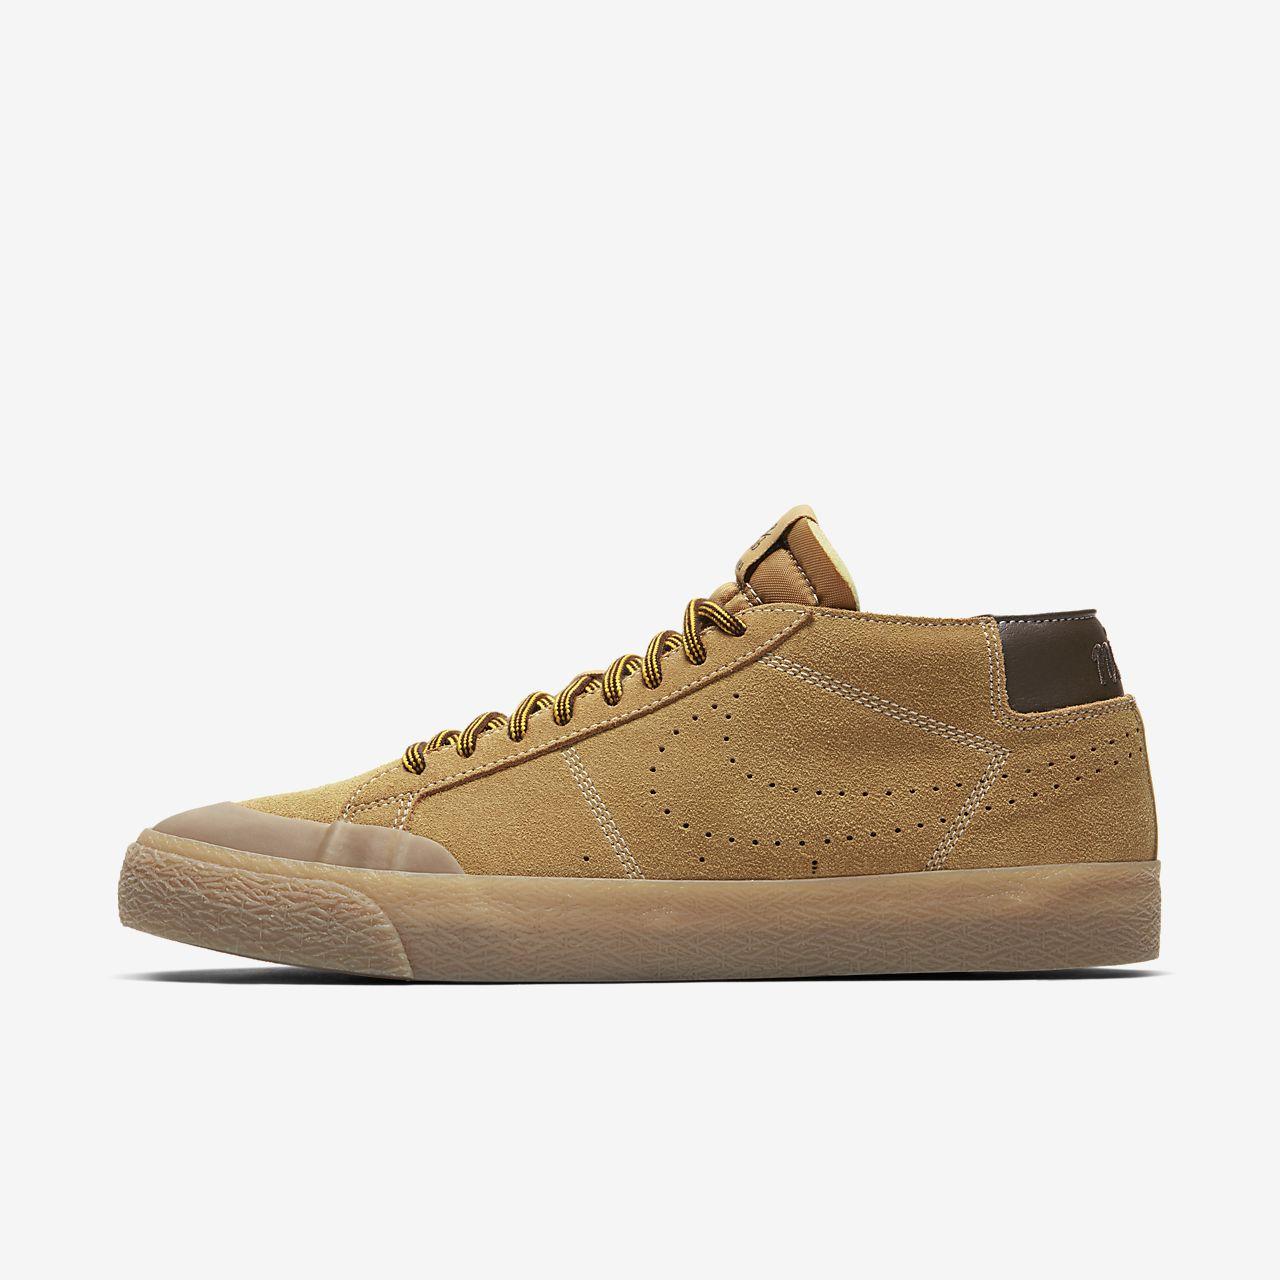 Nike SB Zoom Blazer Chukka XT Premium Skate Shoe